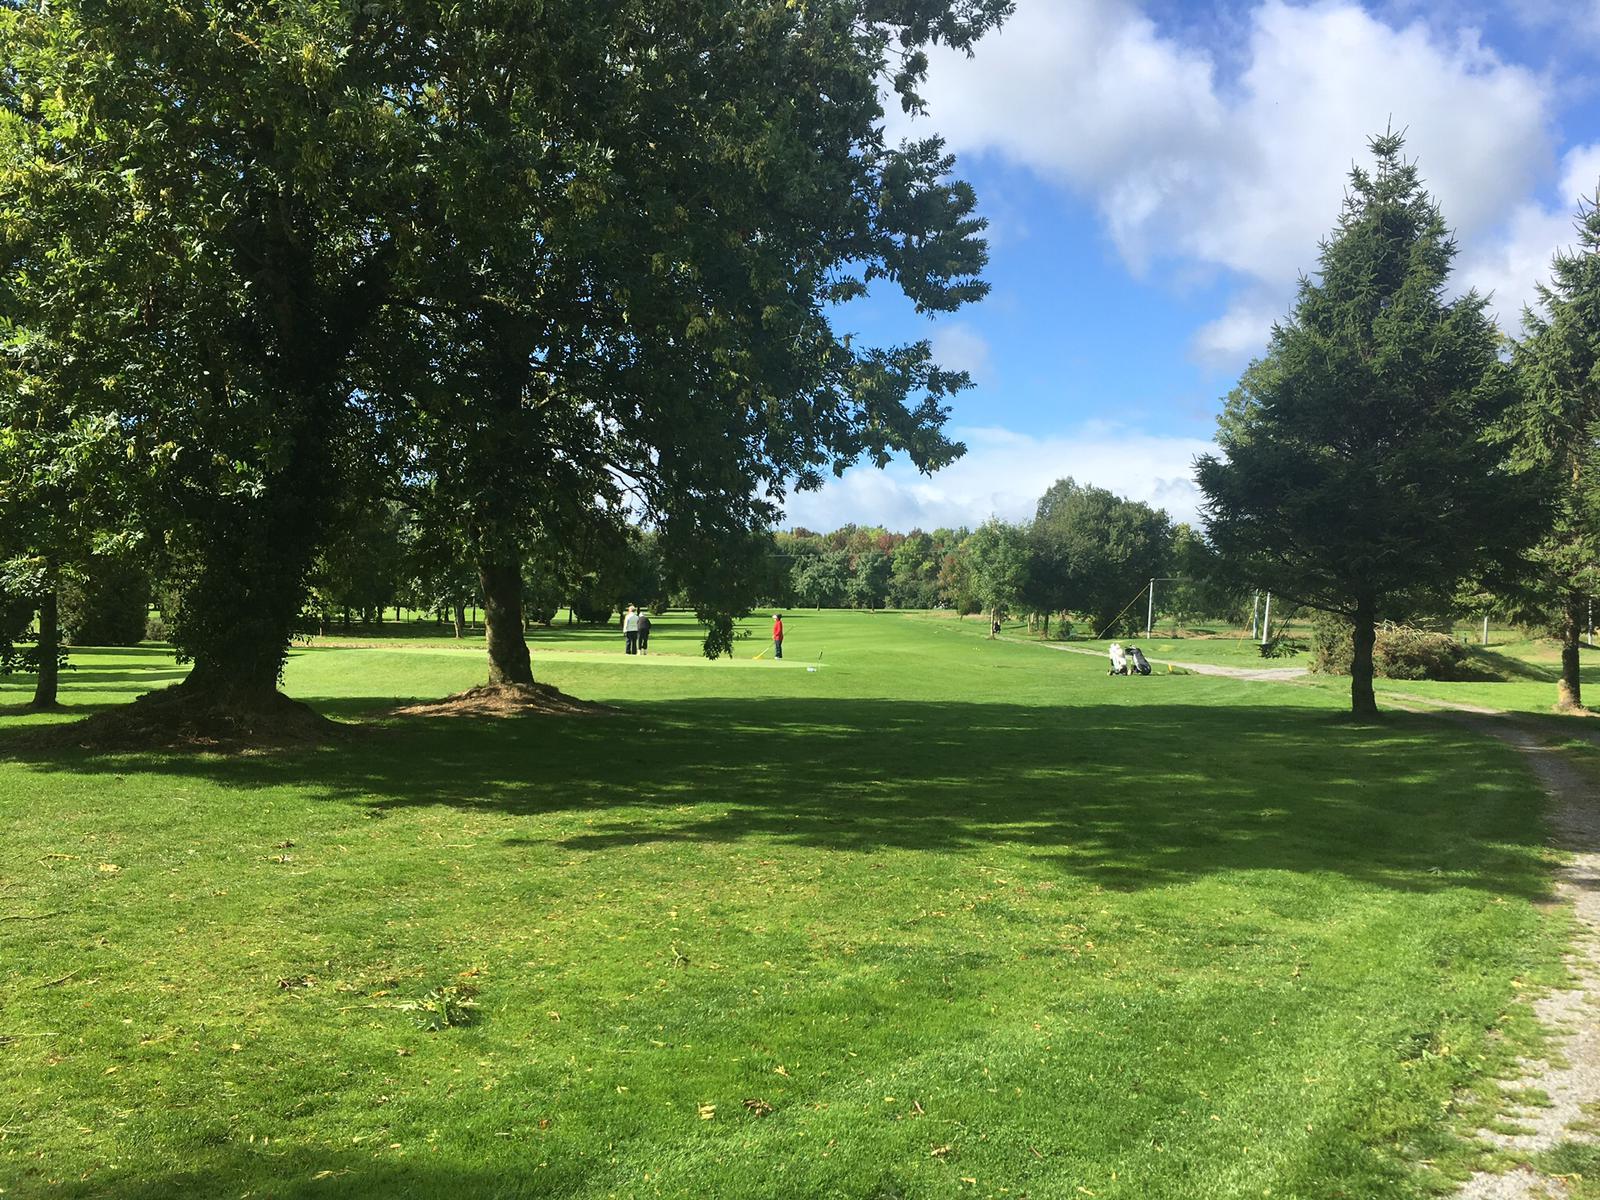 Slievenamon Golf Club green way